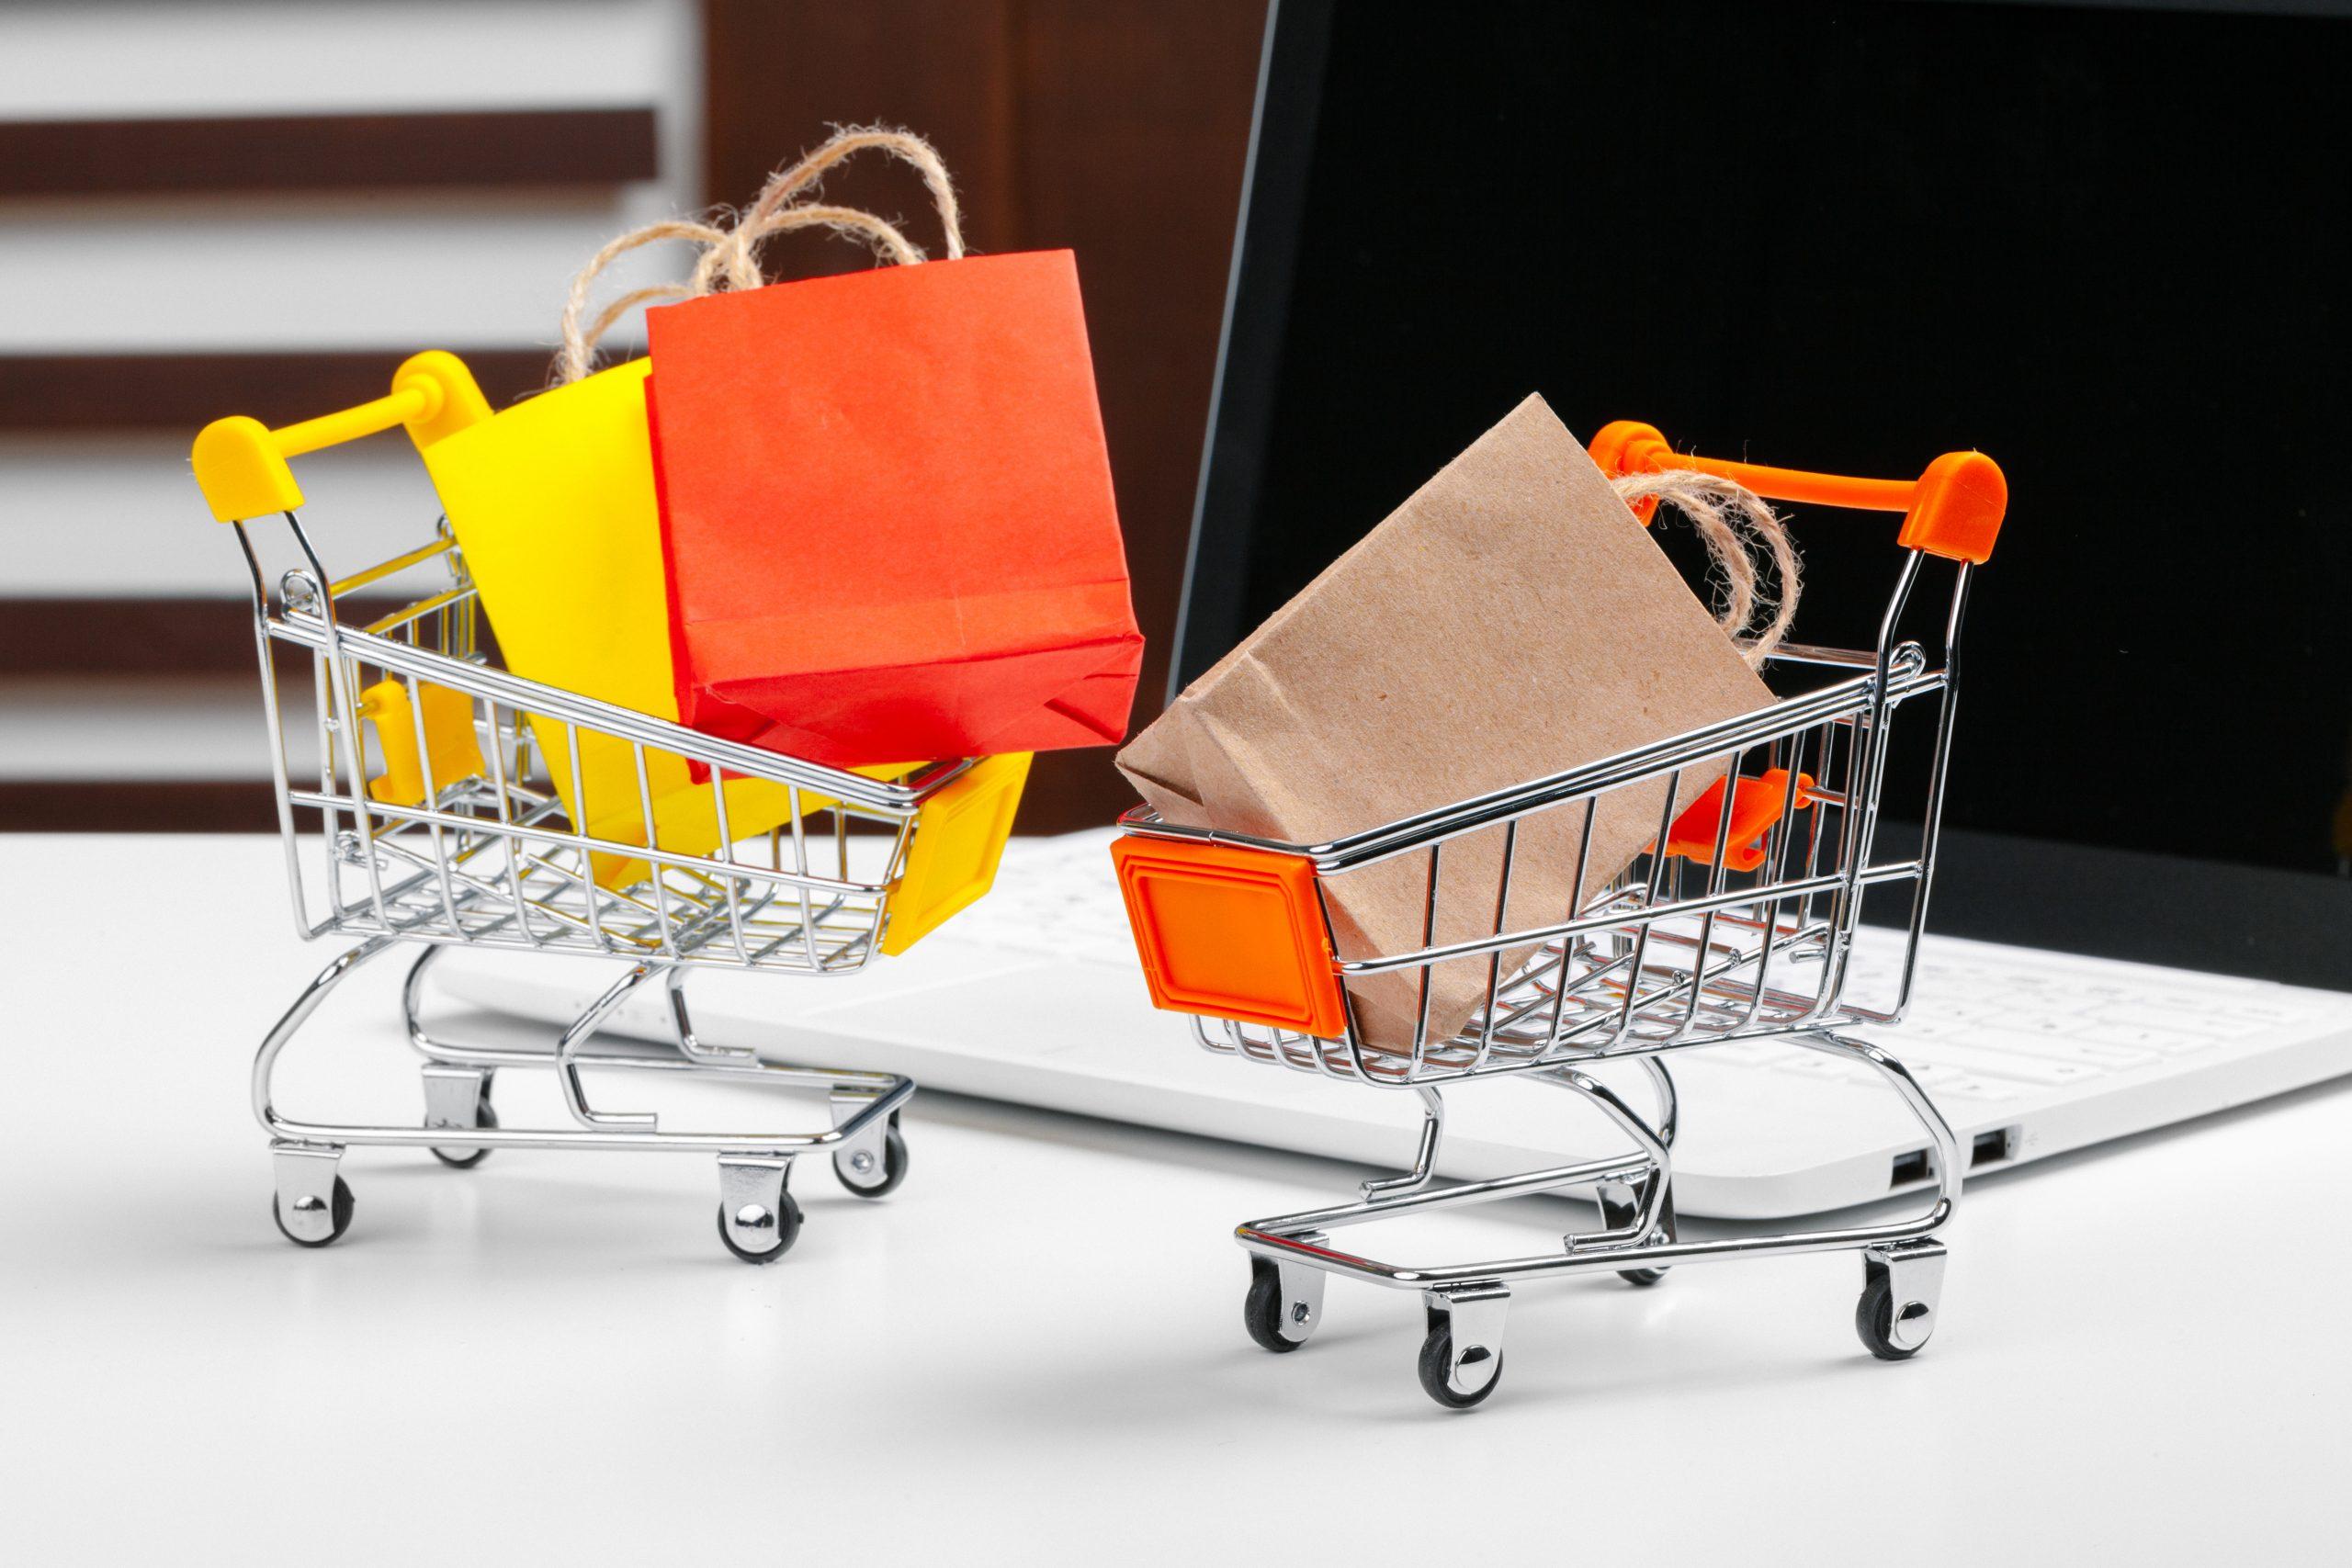 5 Profitable E-Commerce Ideas: Start a New Business